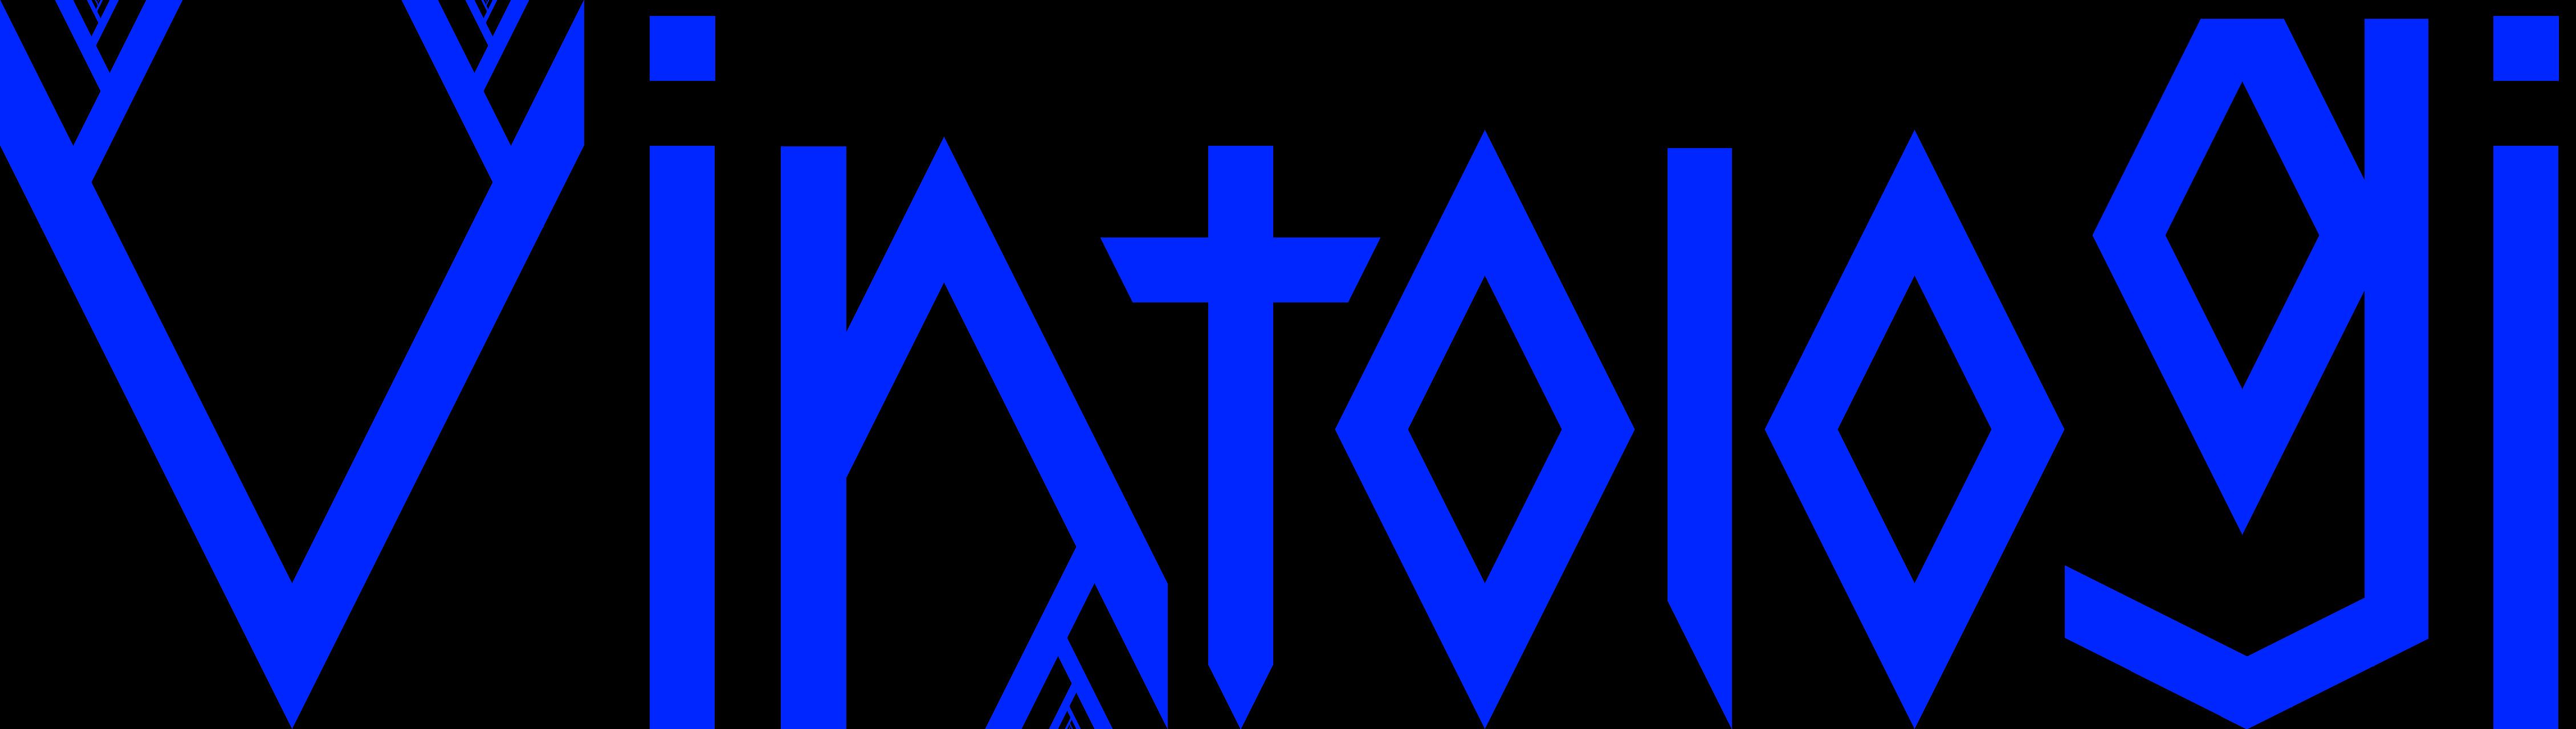 vintologi-logo15.png